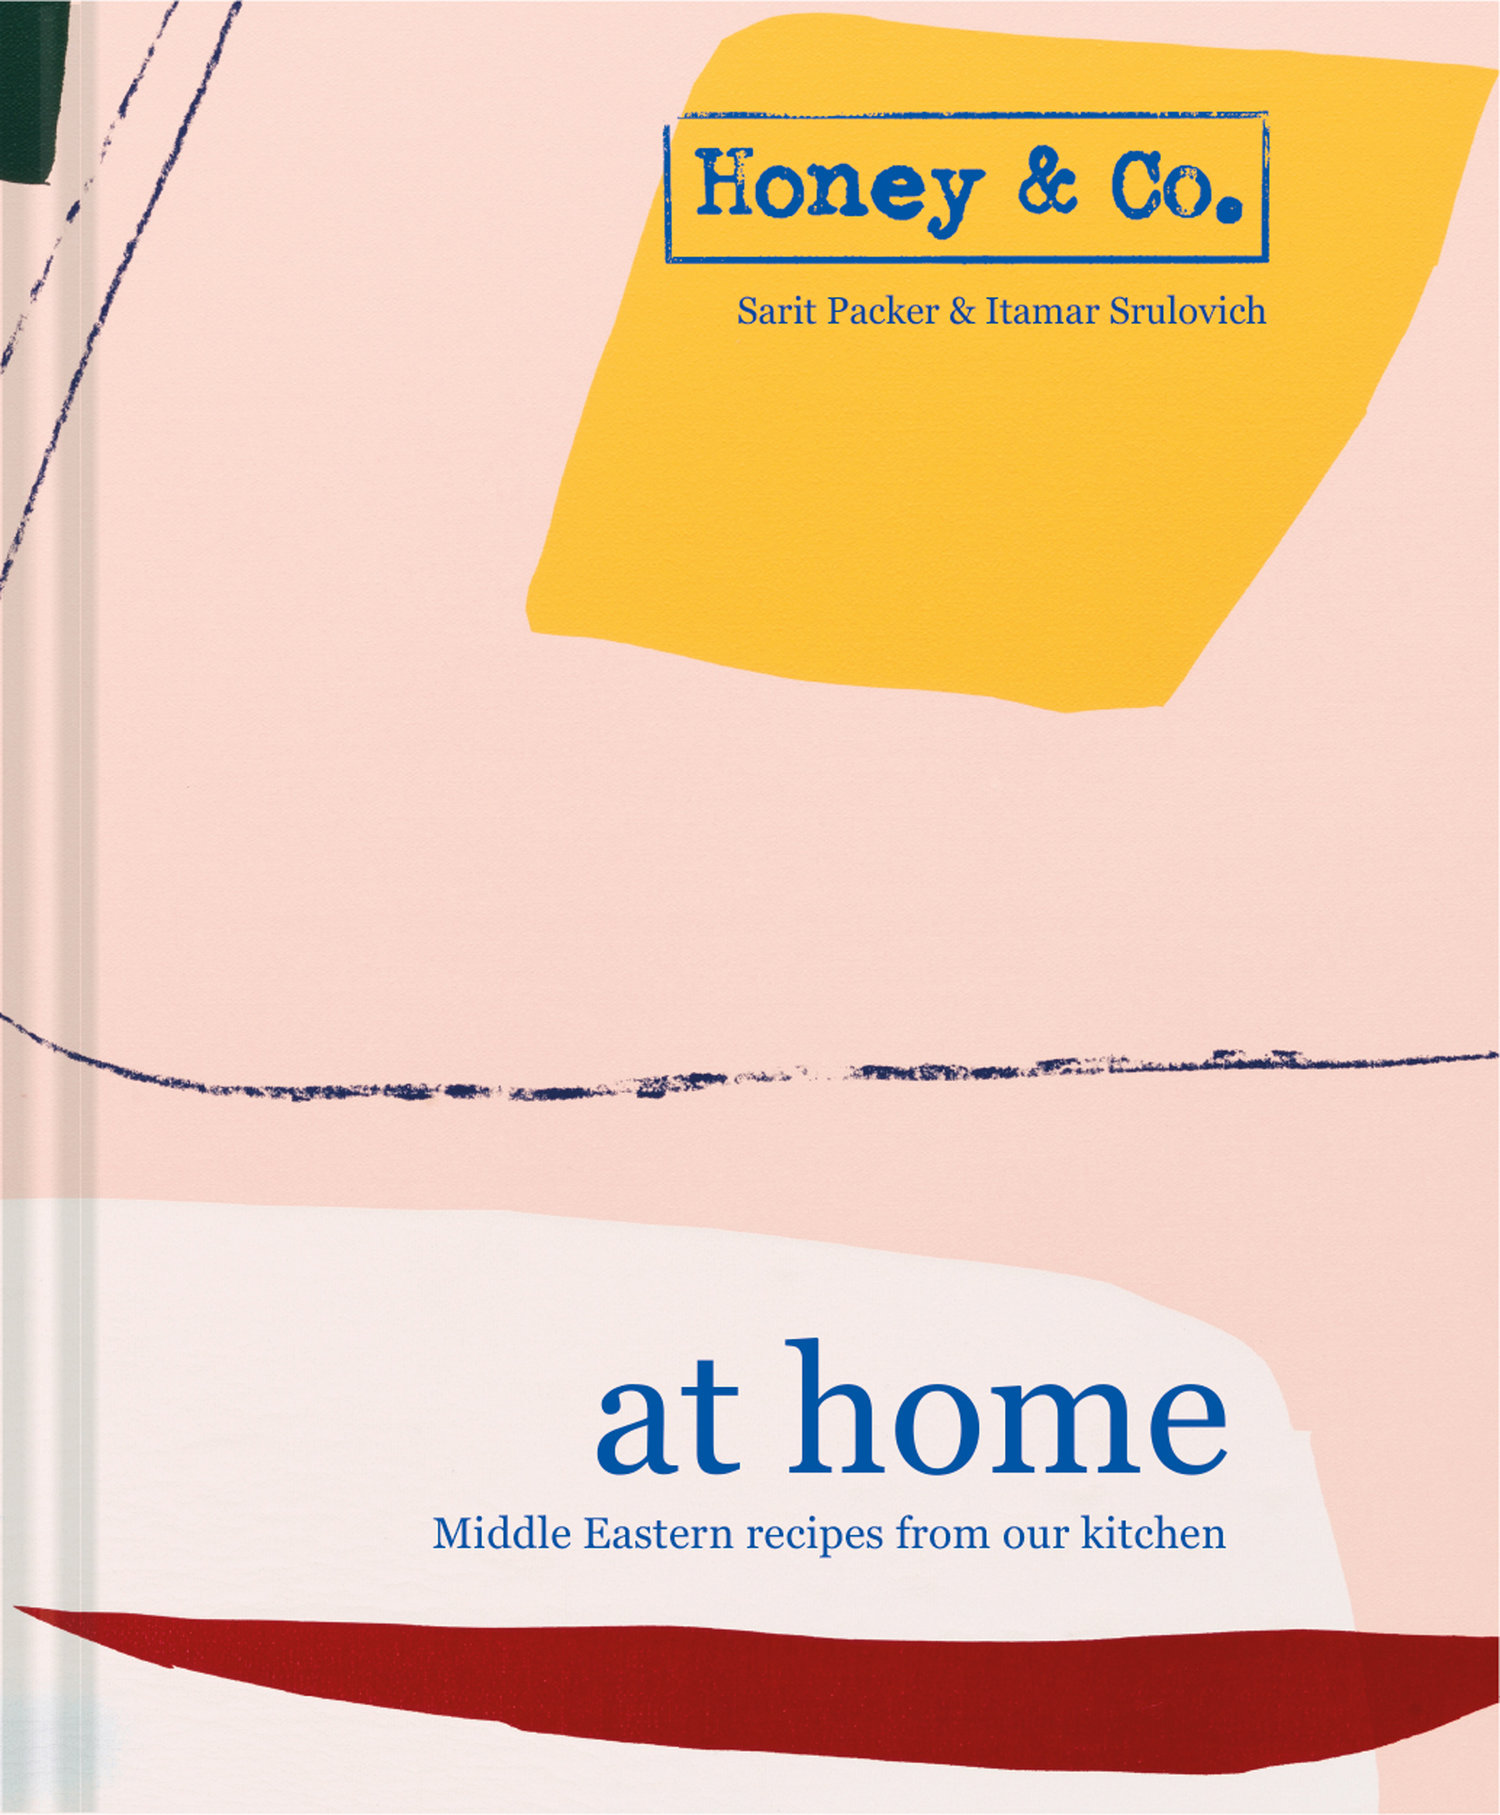 Honey & Co. at Home   Sarit Packer & Itamar Srulovich